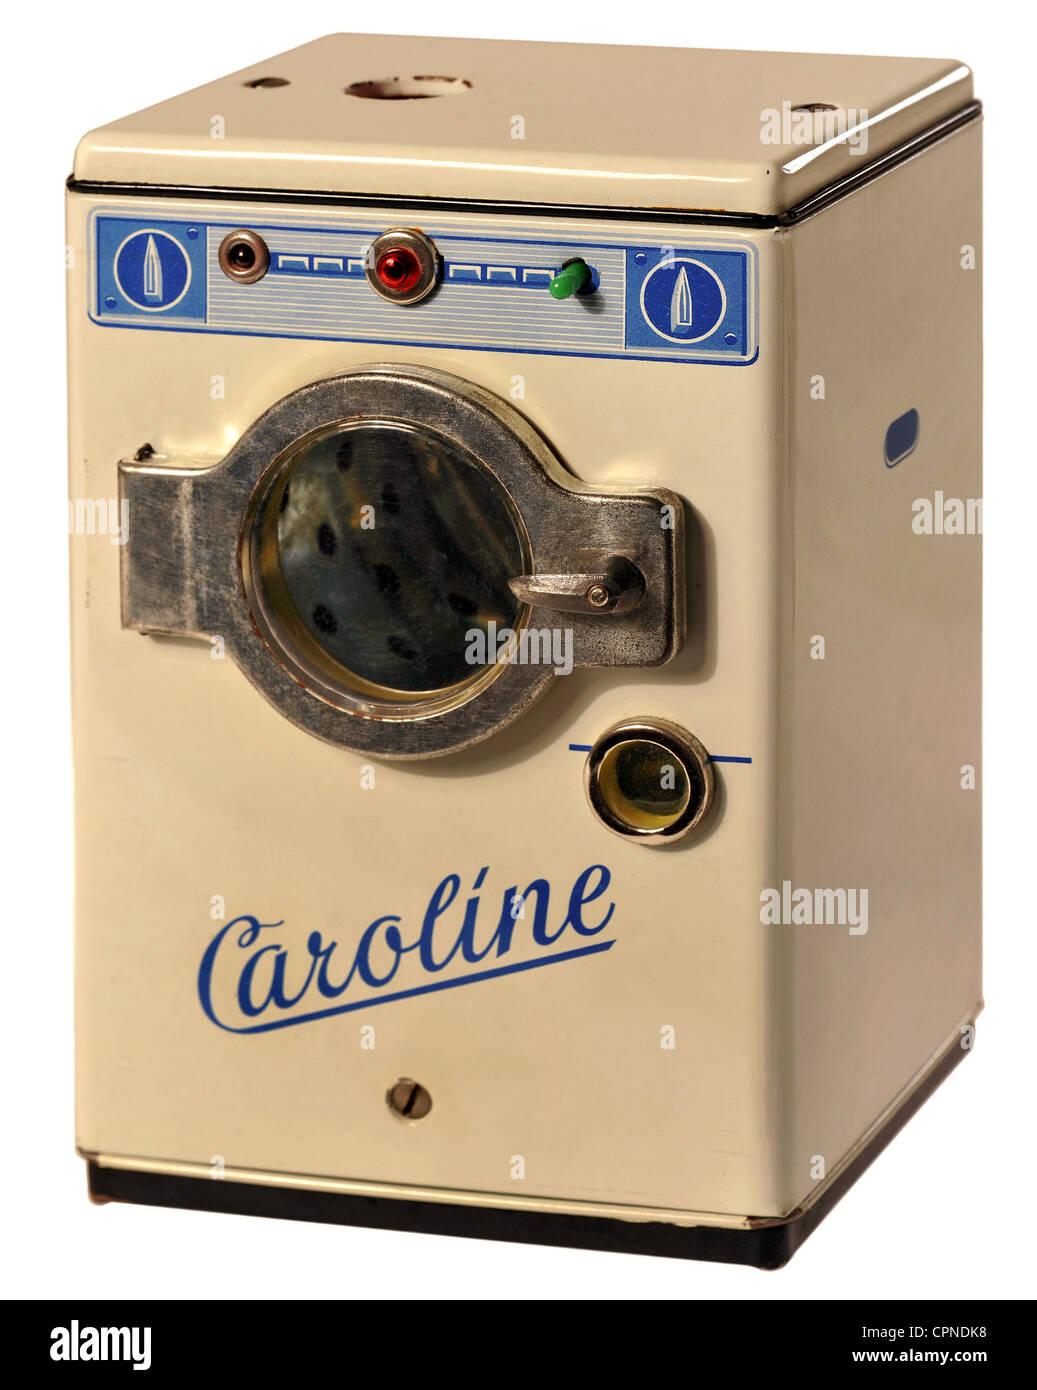 toys washing machine children washing machine caroline. Black Bedroom Furniture Sets. Home Design Ideas